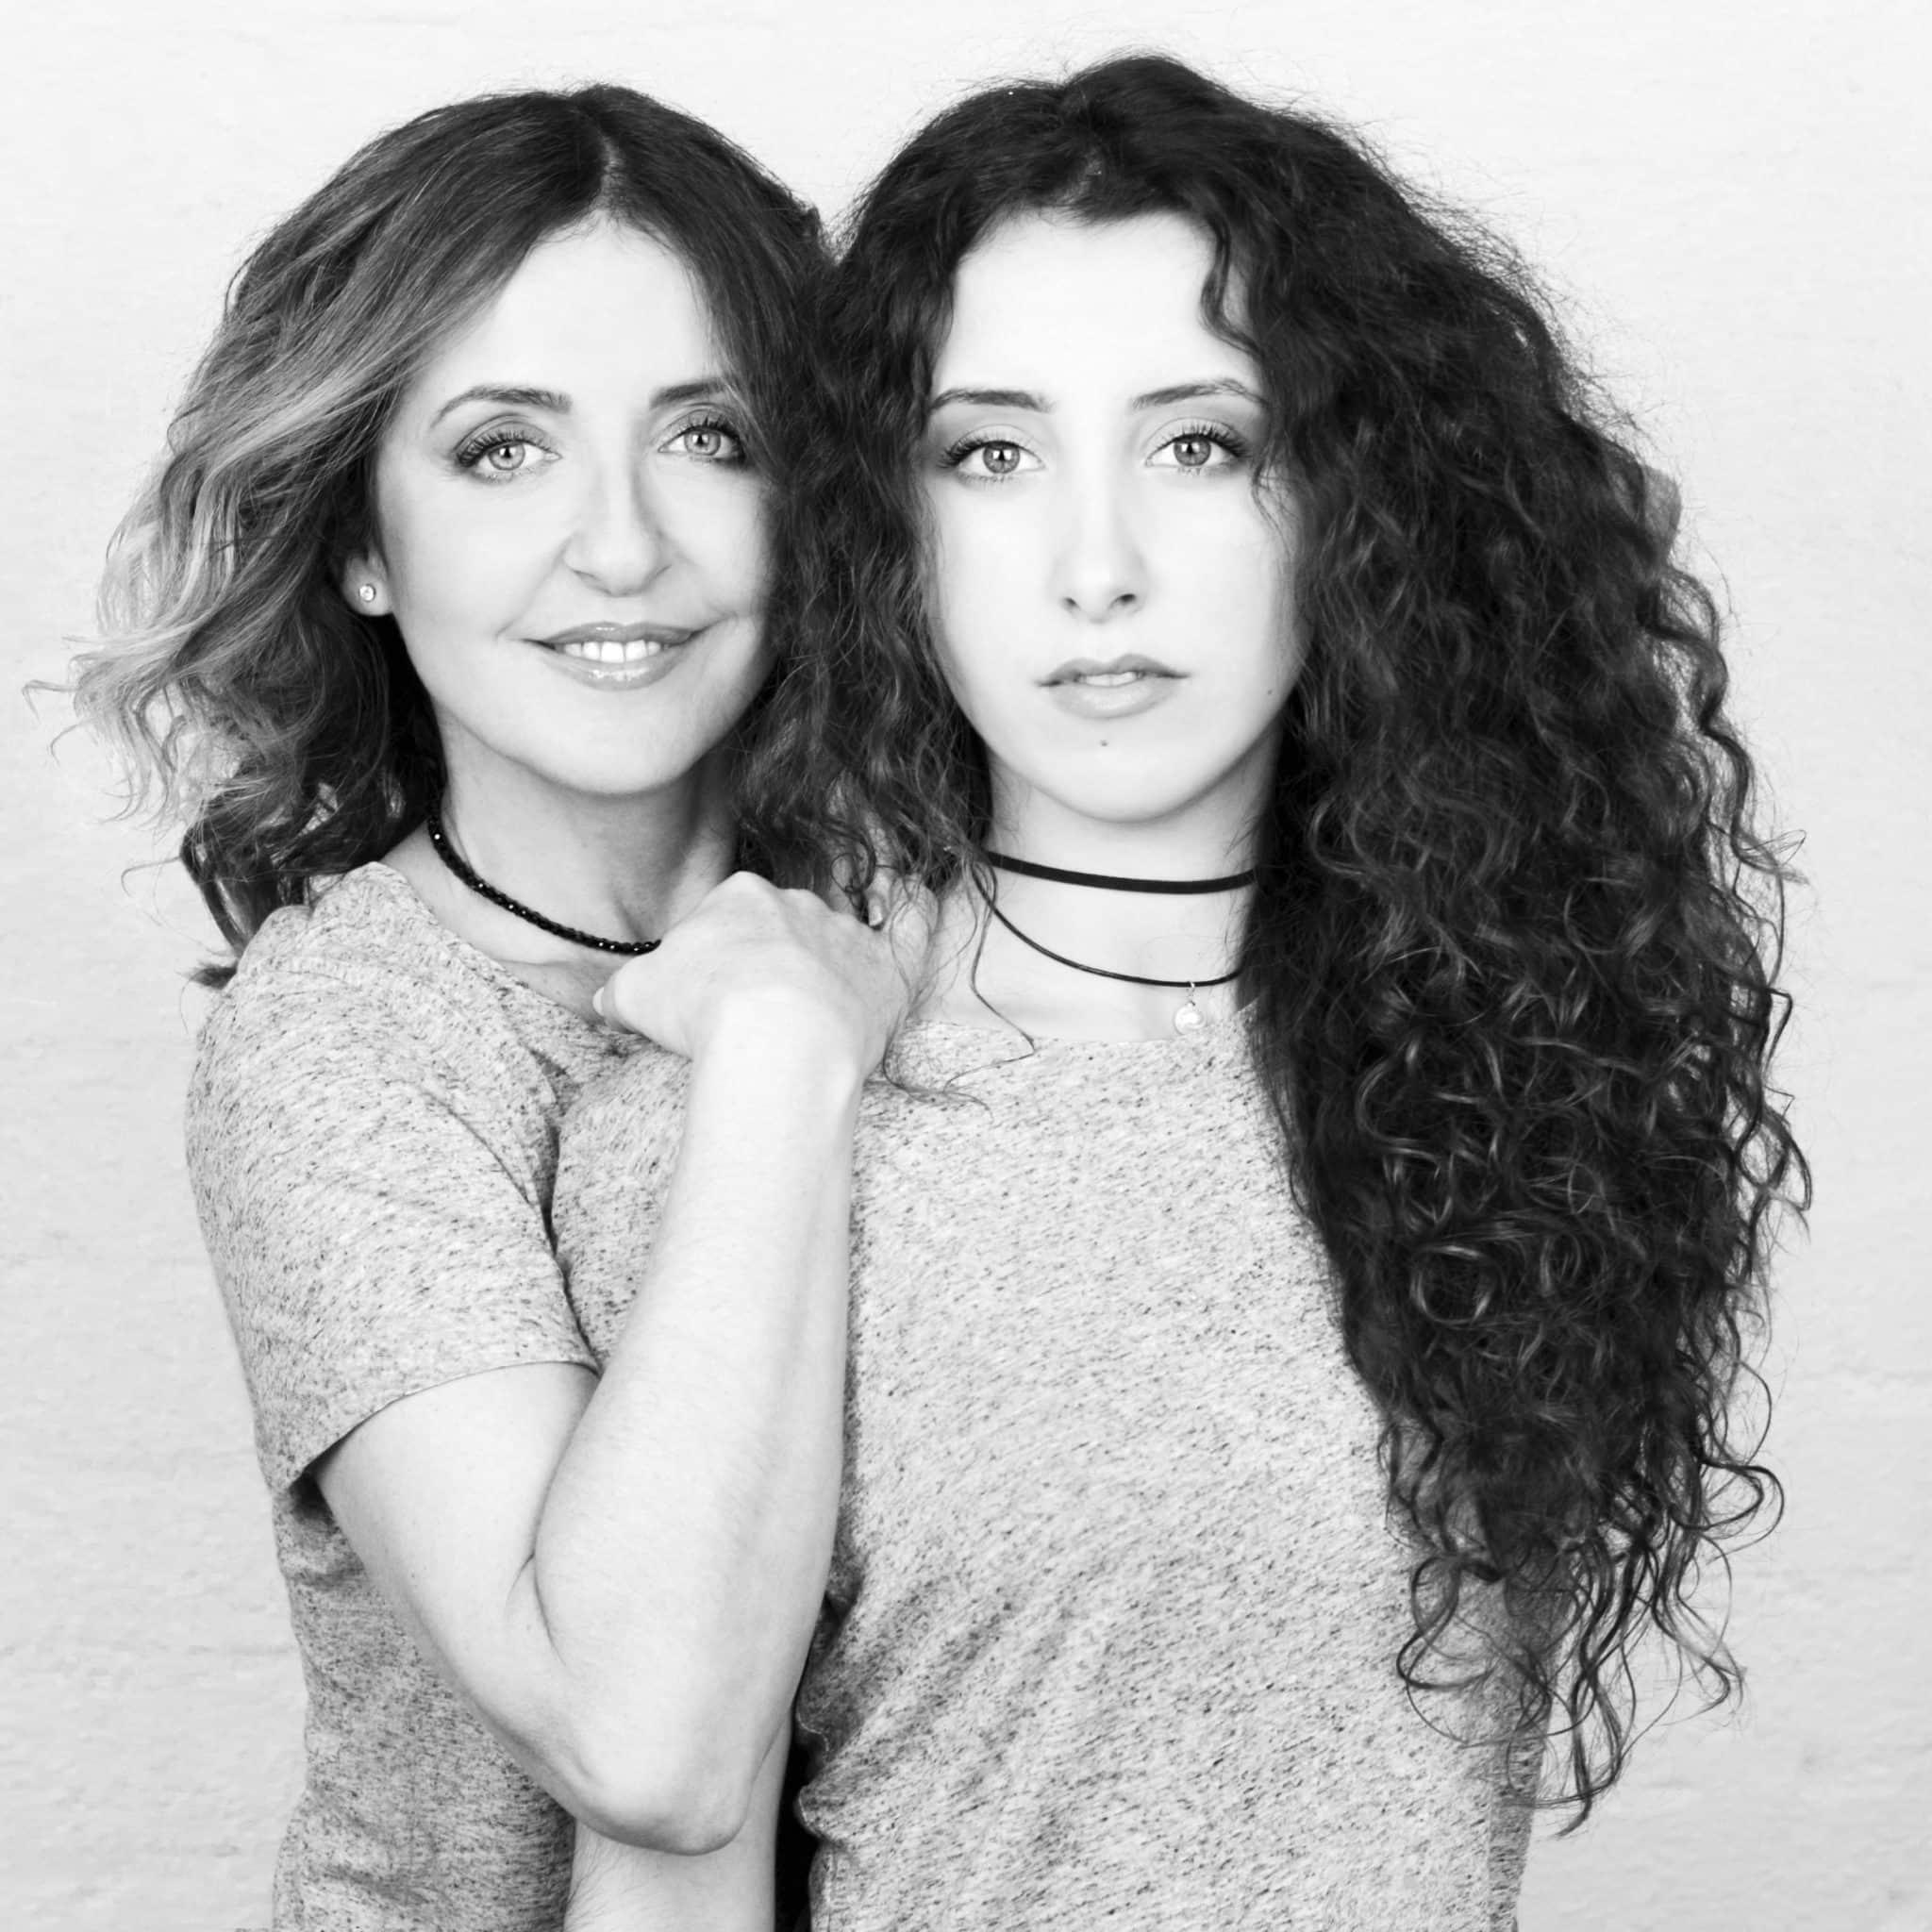 La Gallarda-estudio-fotografico-Malaga-Alhaurin-photographer- fotografo -retrato-familia-hermanas